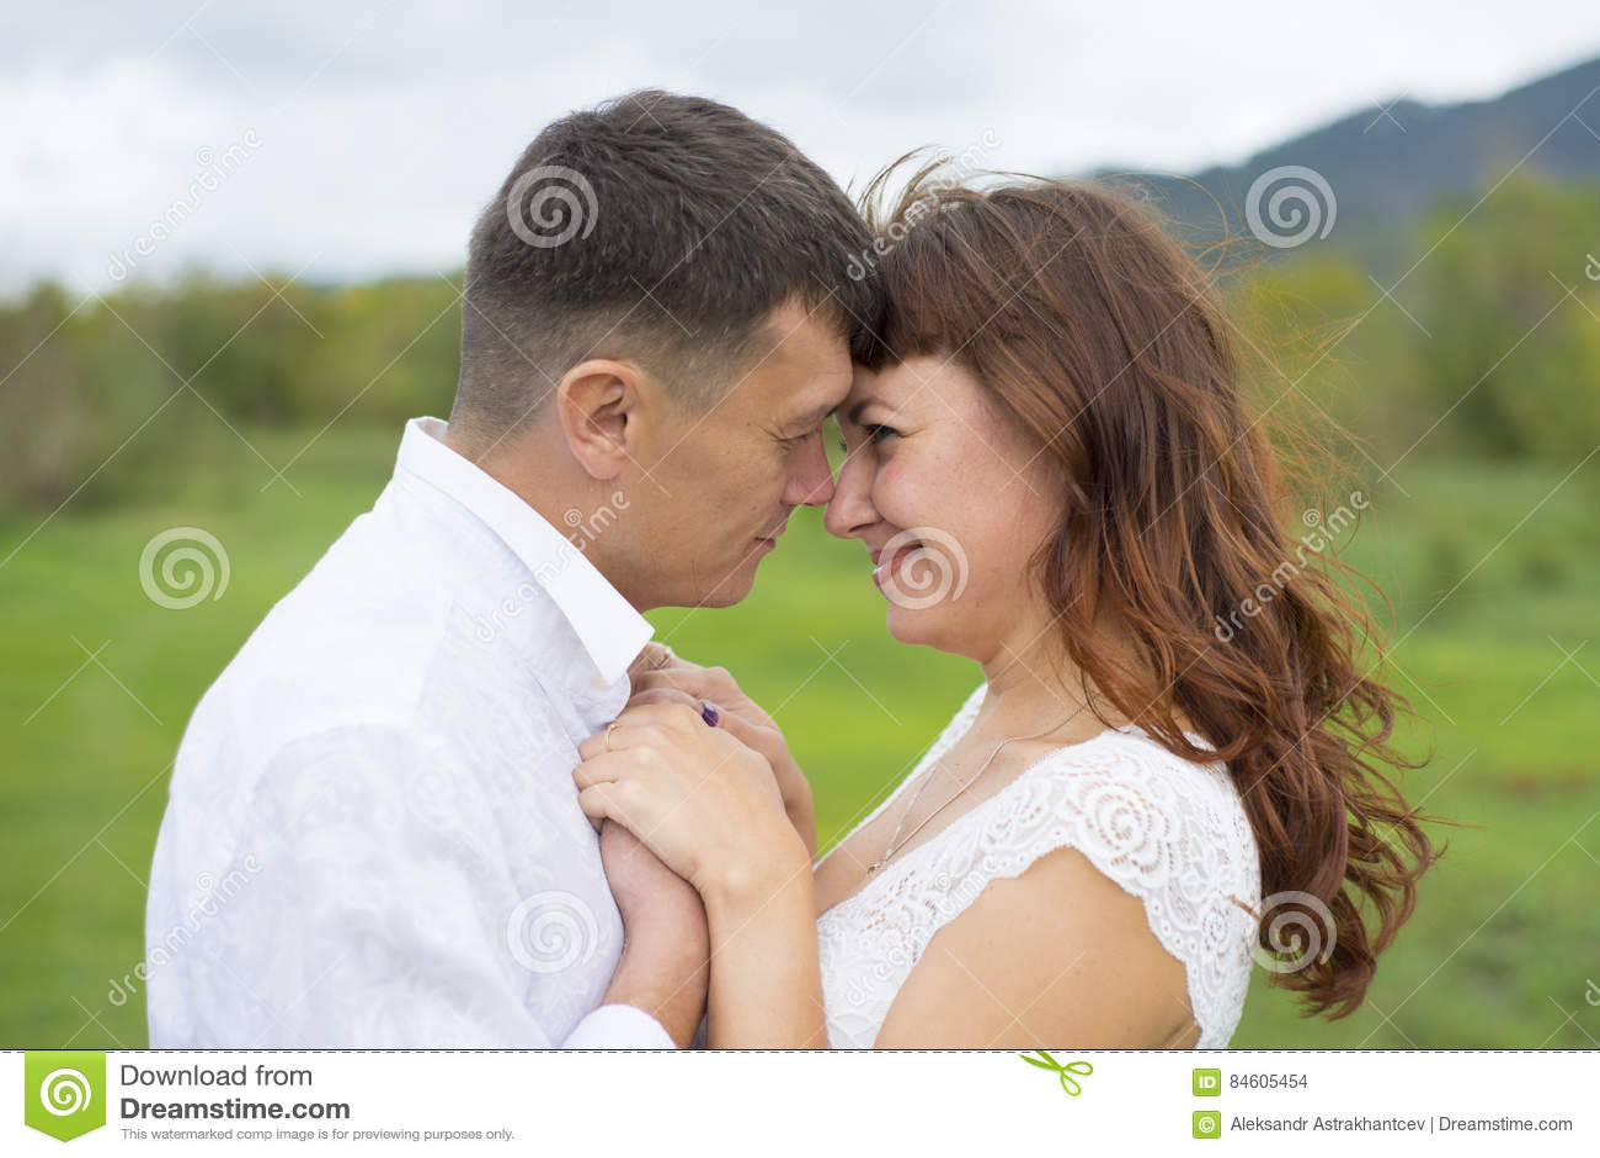 Gentle people dating